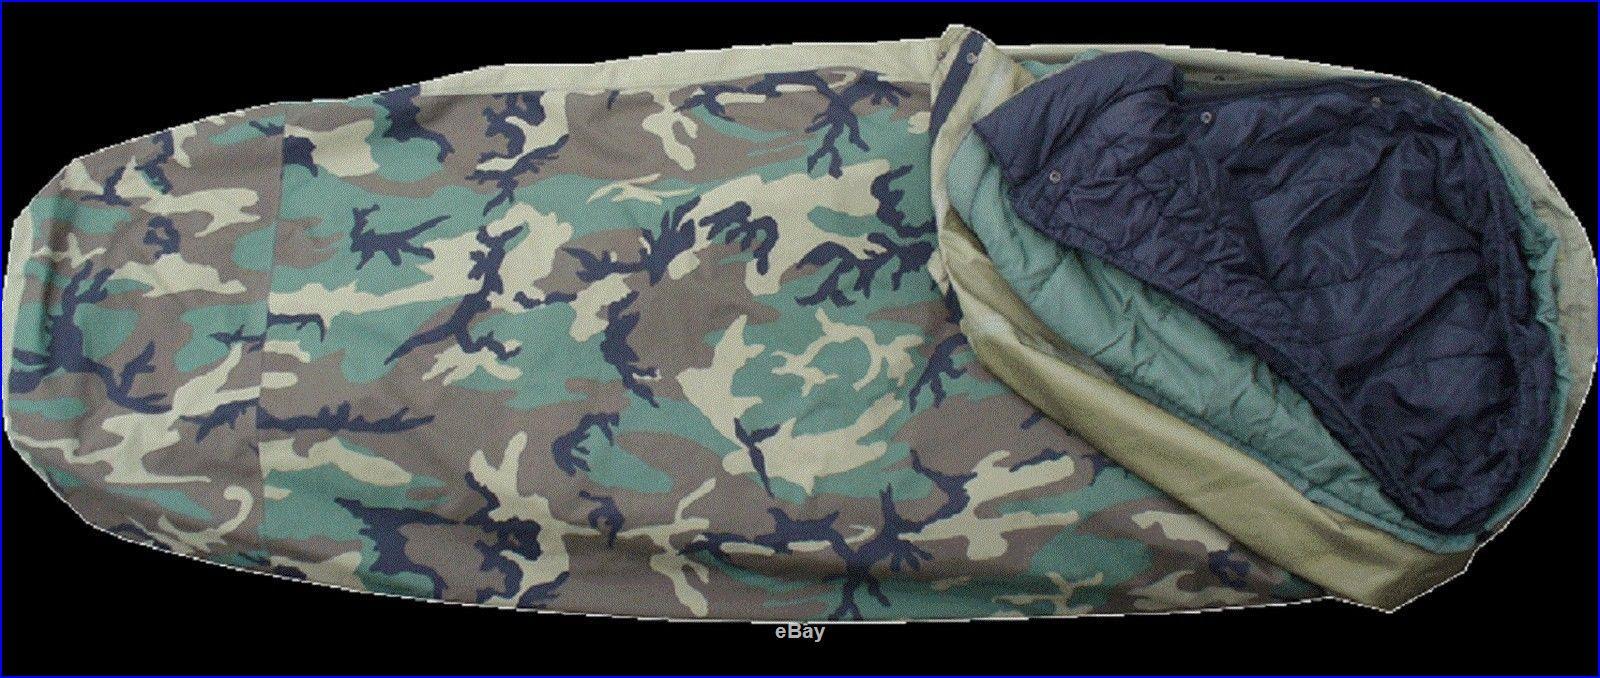 Modular Sleep System Sleeping Bags Military USMC Army